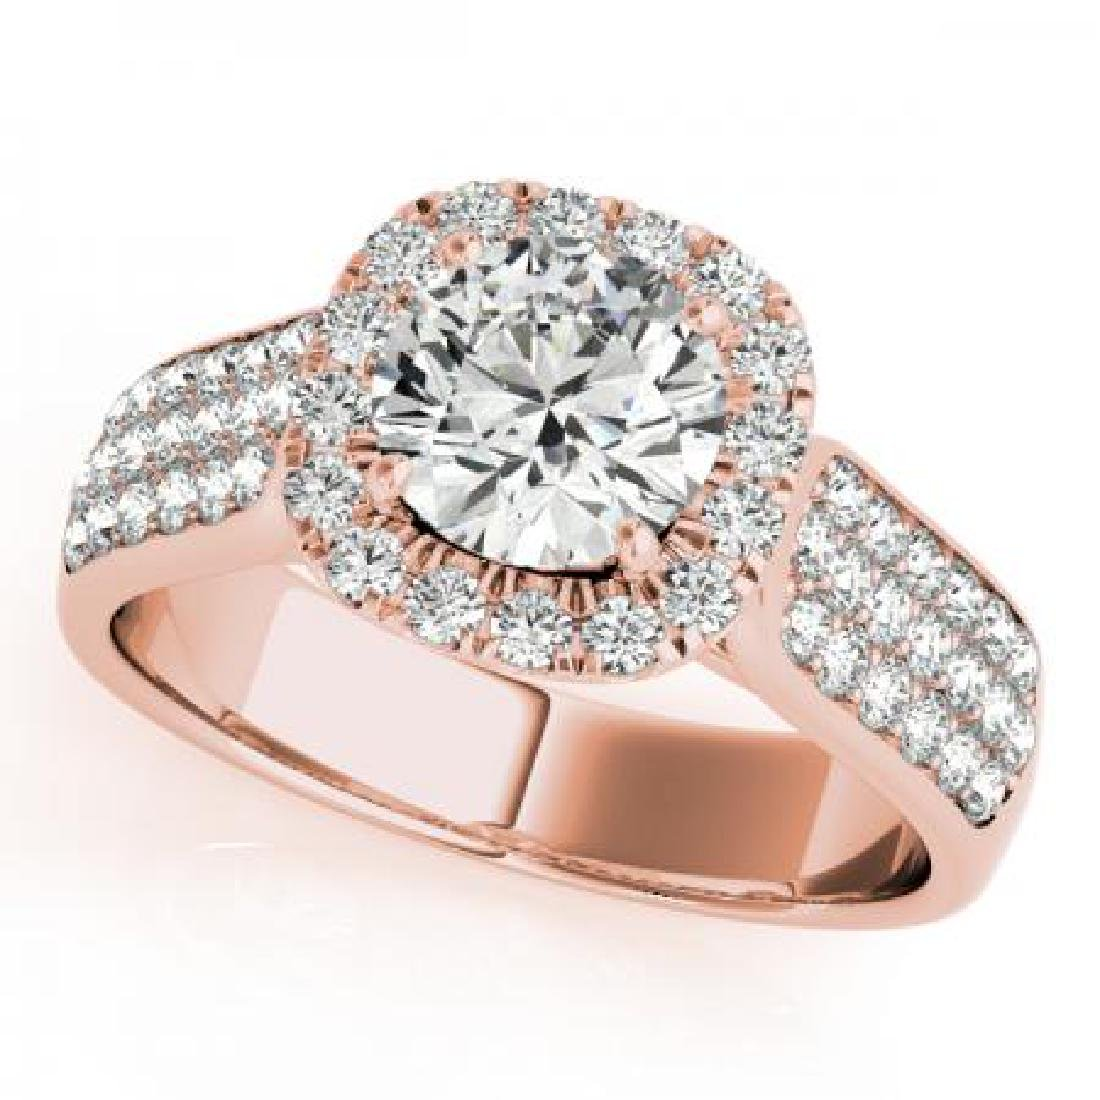 CERTIFIED 18K ROSE GOLD 1.40 CT G-H/VS-SI1 DIAMOND HALO